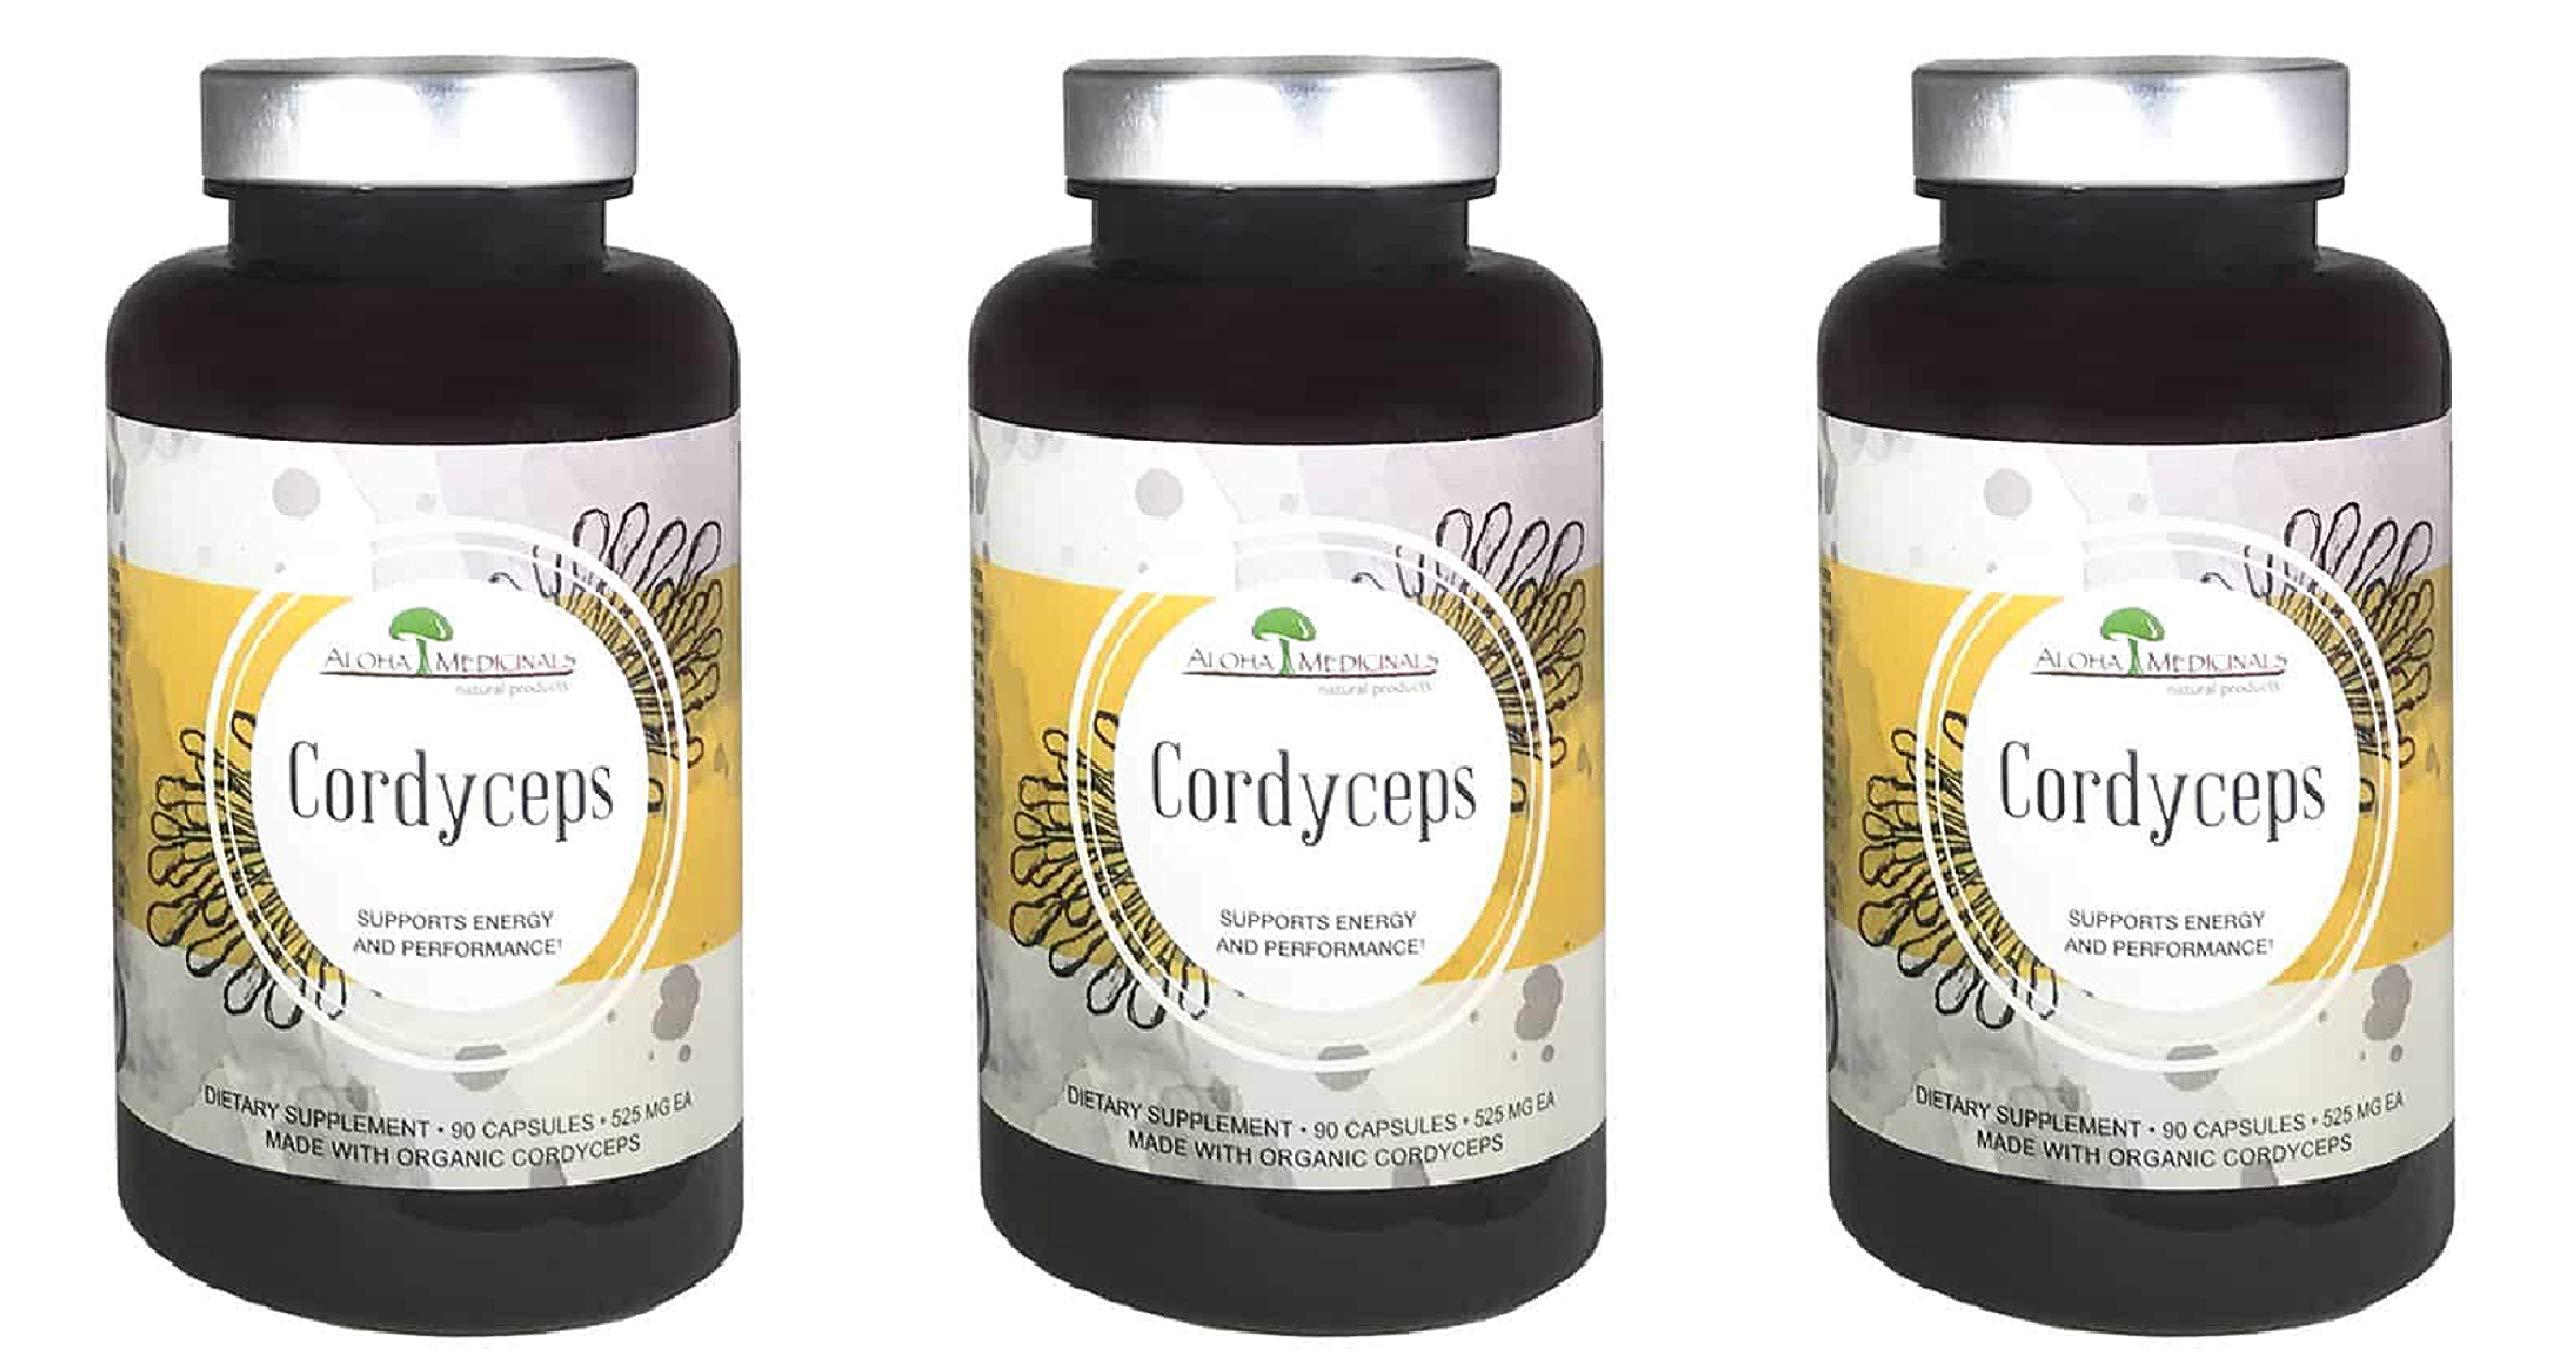 Aloha Medicinals - Pure Cordyceps - Certified Organic Mushrooms - Cordyceps Militaris - Cordyceps Sinensis - Supports Immunity, Energy and Stamina - 525mg - 90 Vegetarian Capsules (3-Pack)